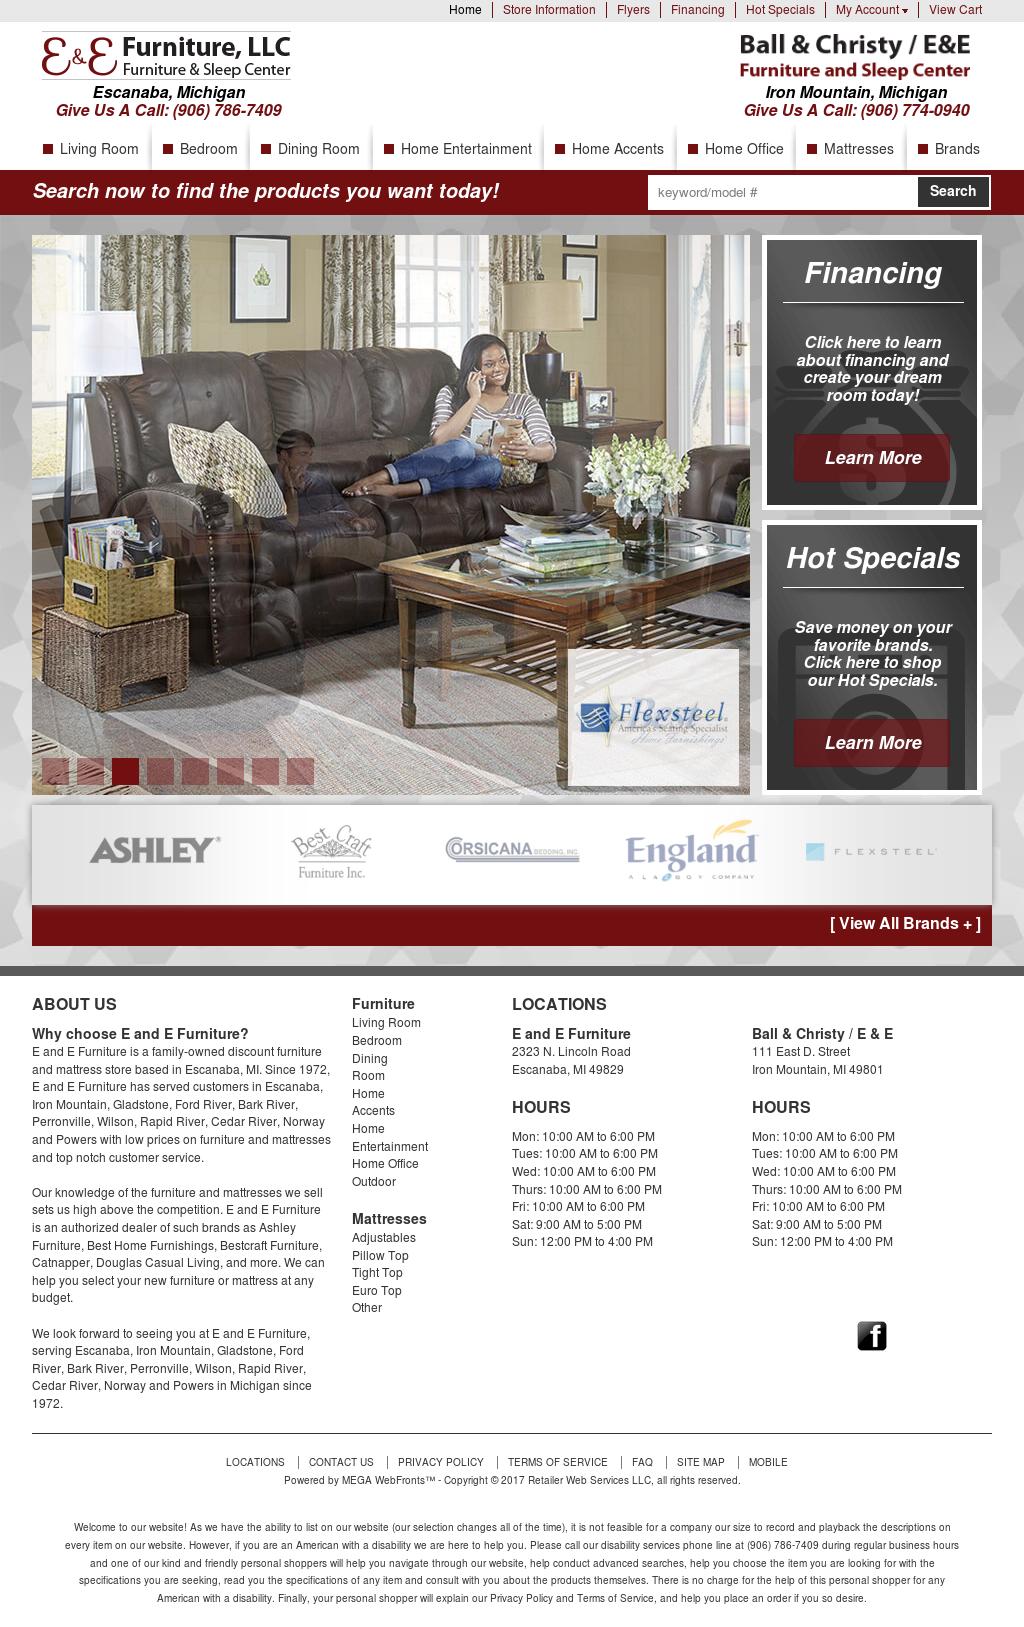 Etonnant E U0026 E Furniture Website History